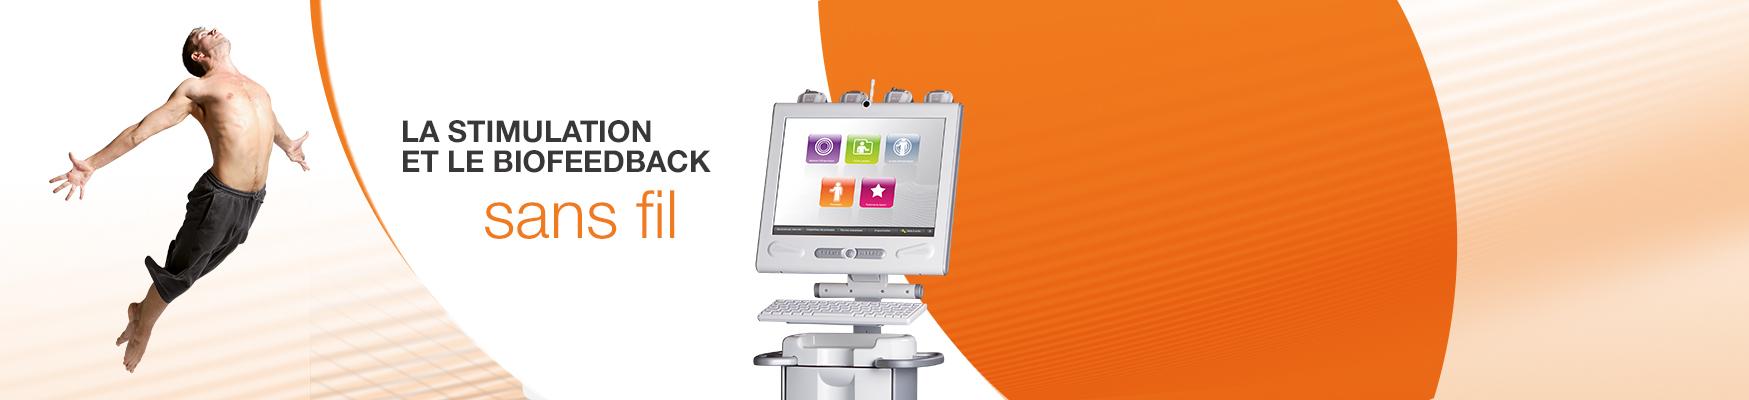 Formation Phenix vivaltis liberty, néo et USB Micro